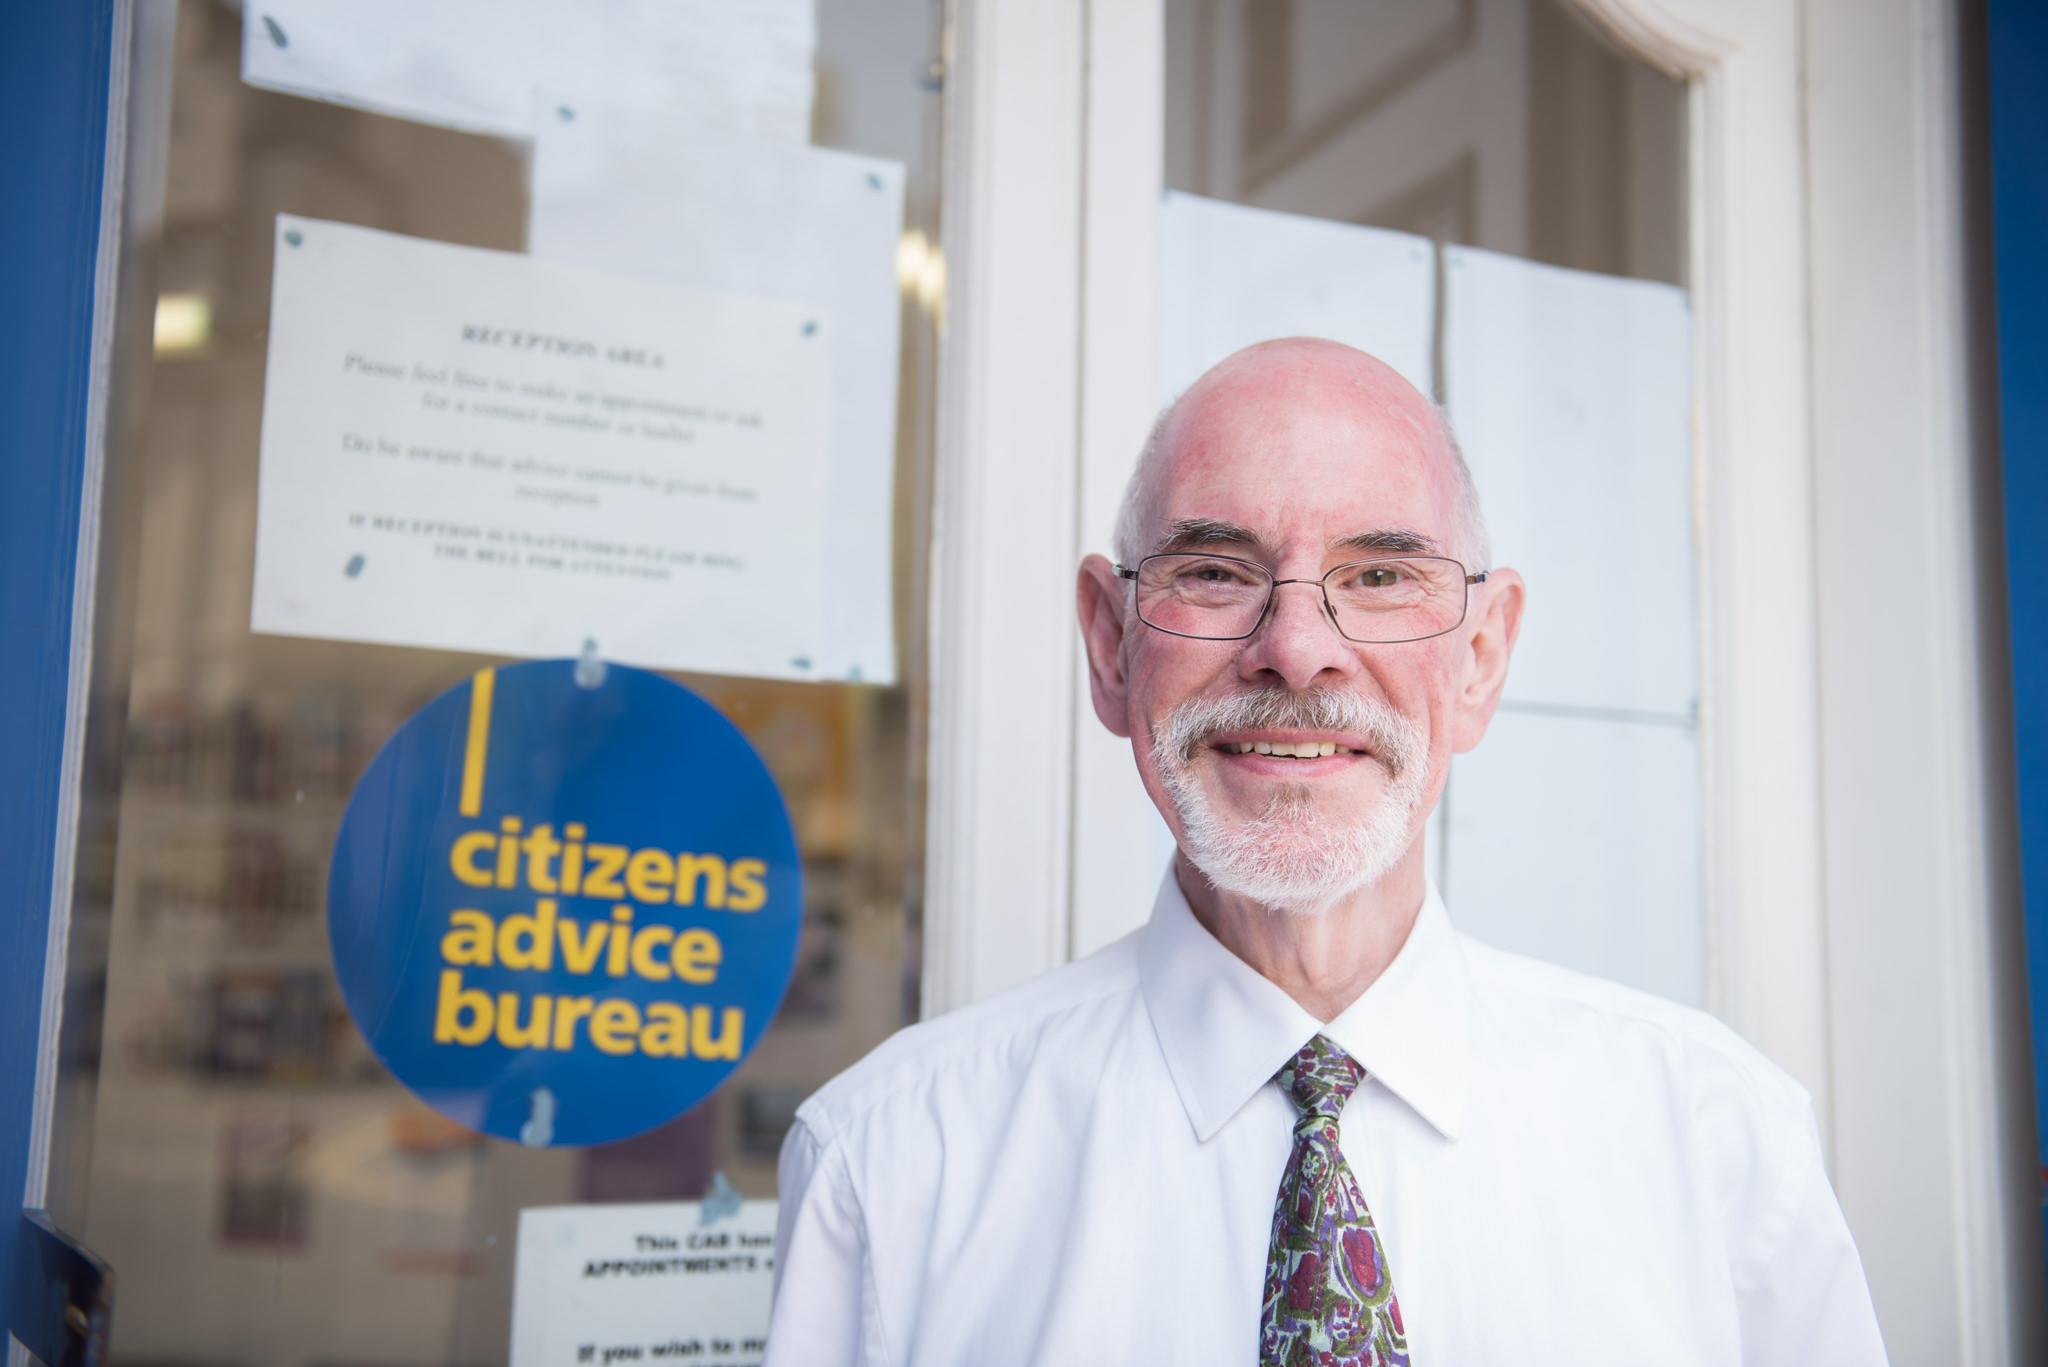 Citizens Advice Edinburgh - June 2016 - © Photography by Juliebee - www.juliebee.co.uk